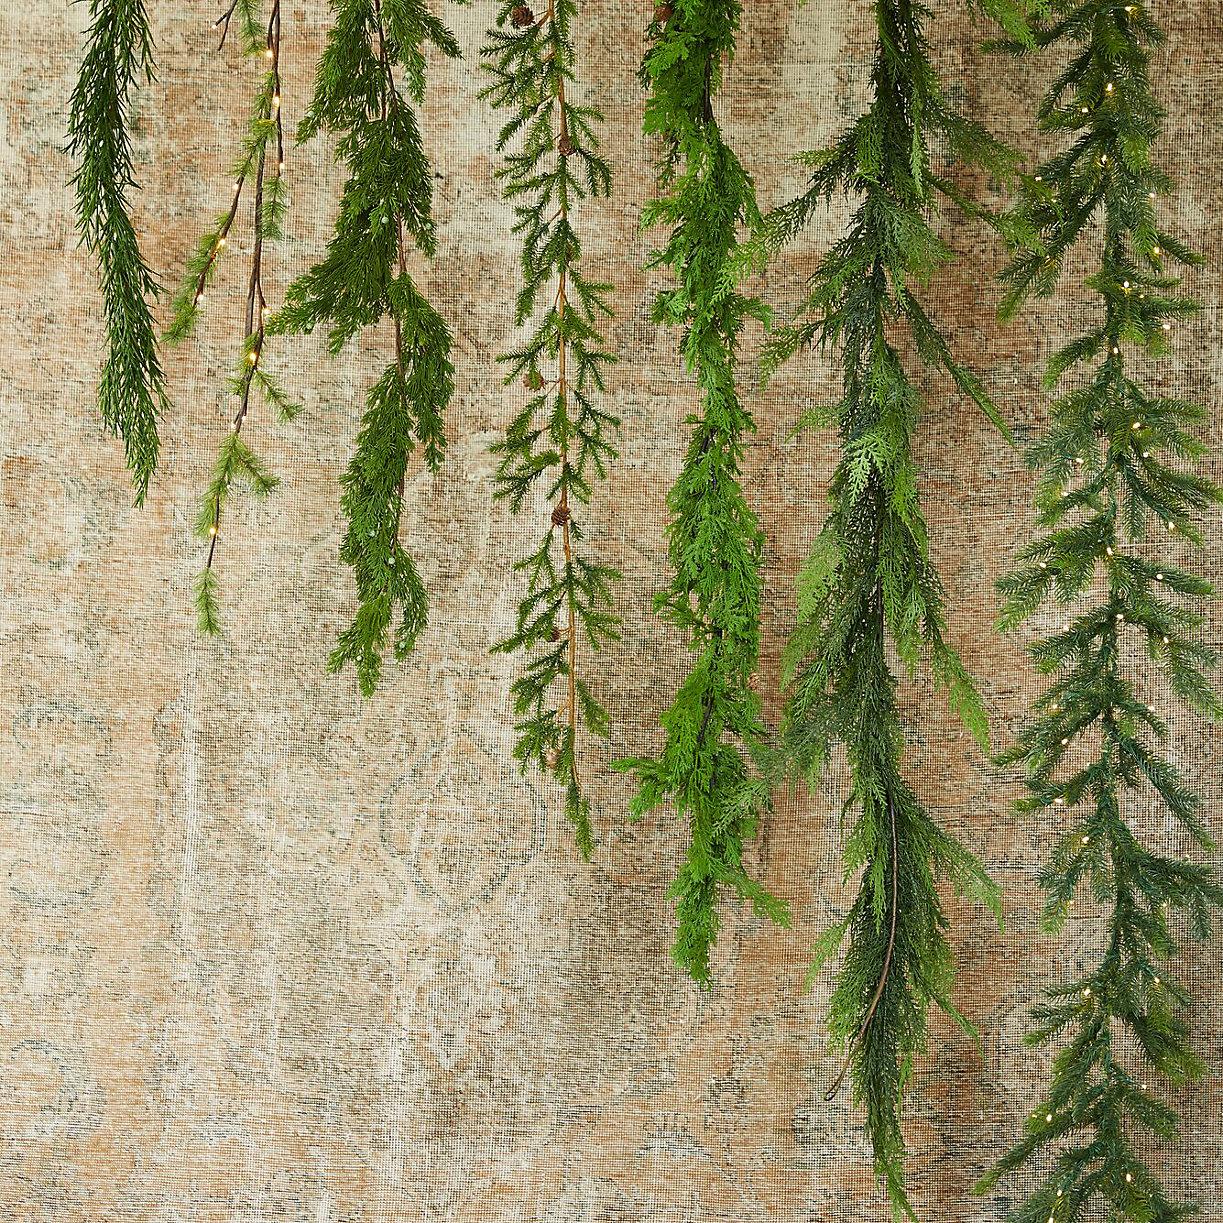 Series-of-garlands-from-Terrain